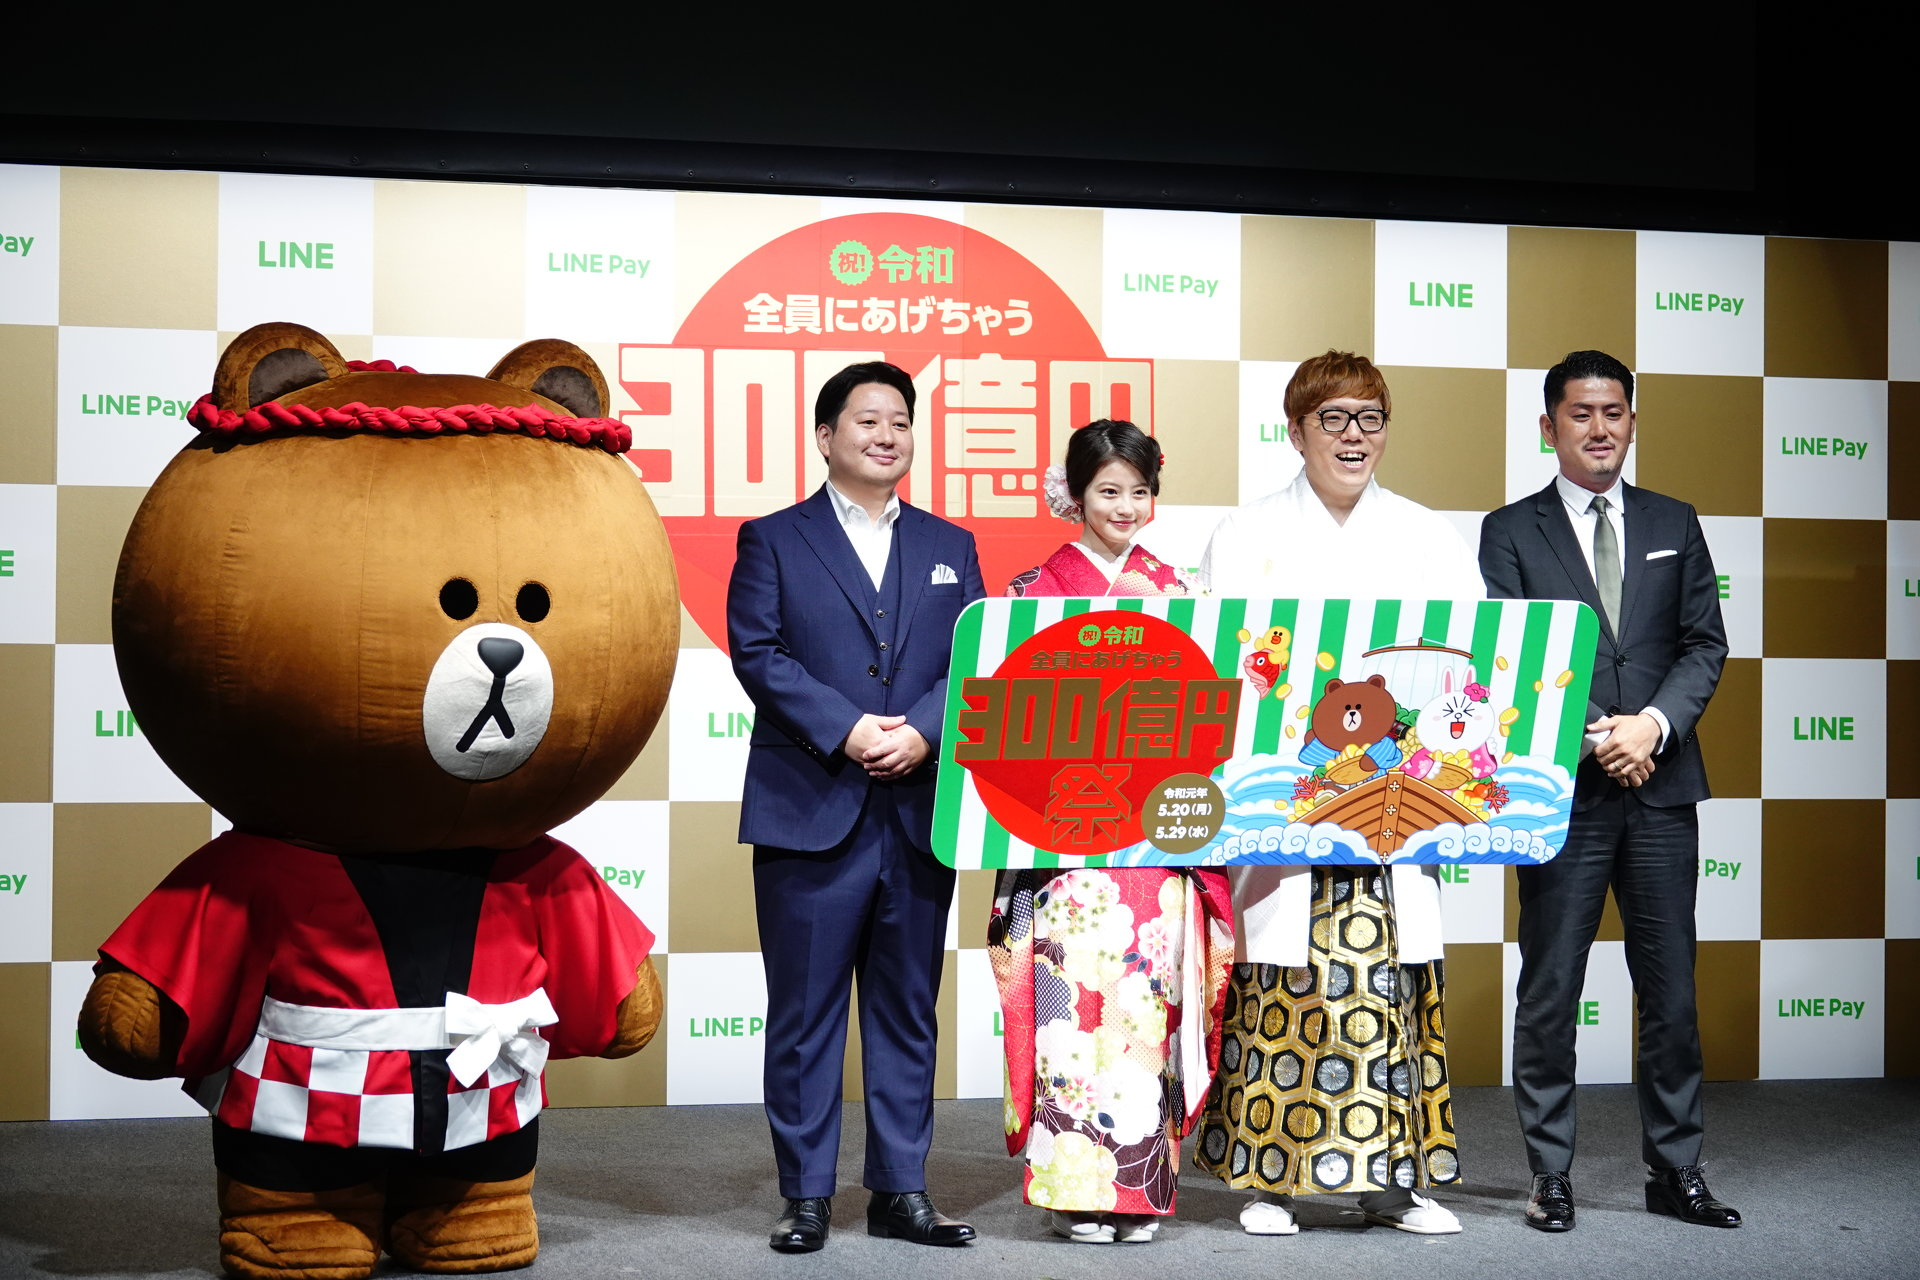 https://image.itmedia.co.jp/news/articles/1905/16/l_kf_linepay_01.jpg